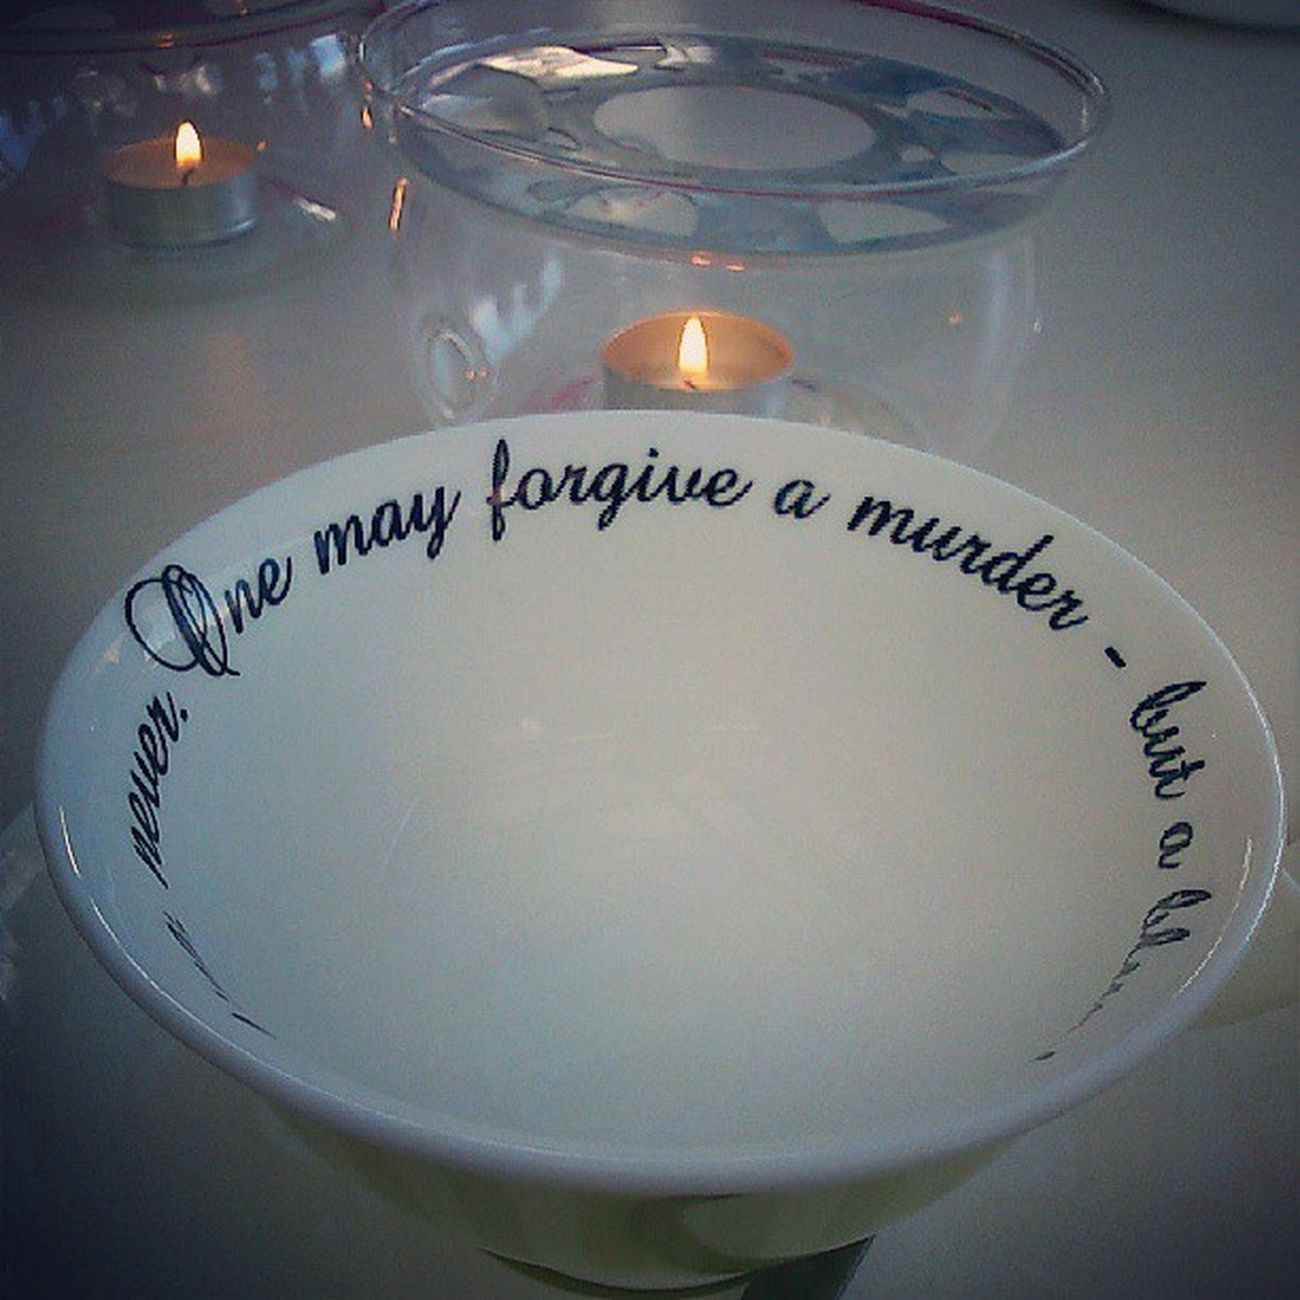 Generous forgiveness...